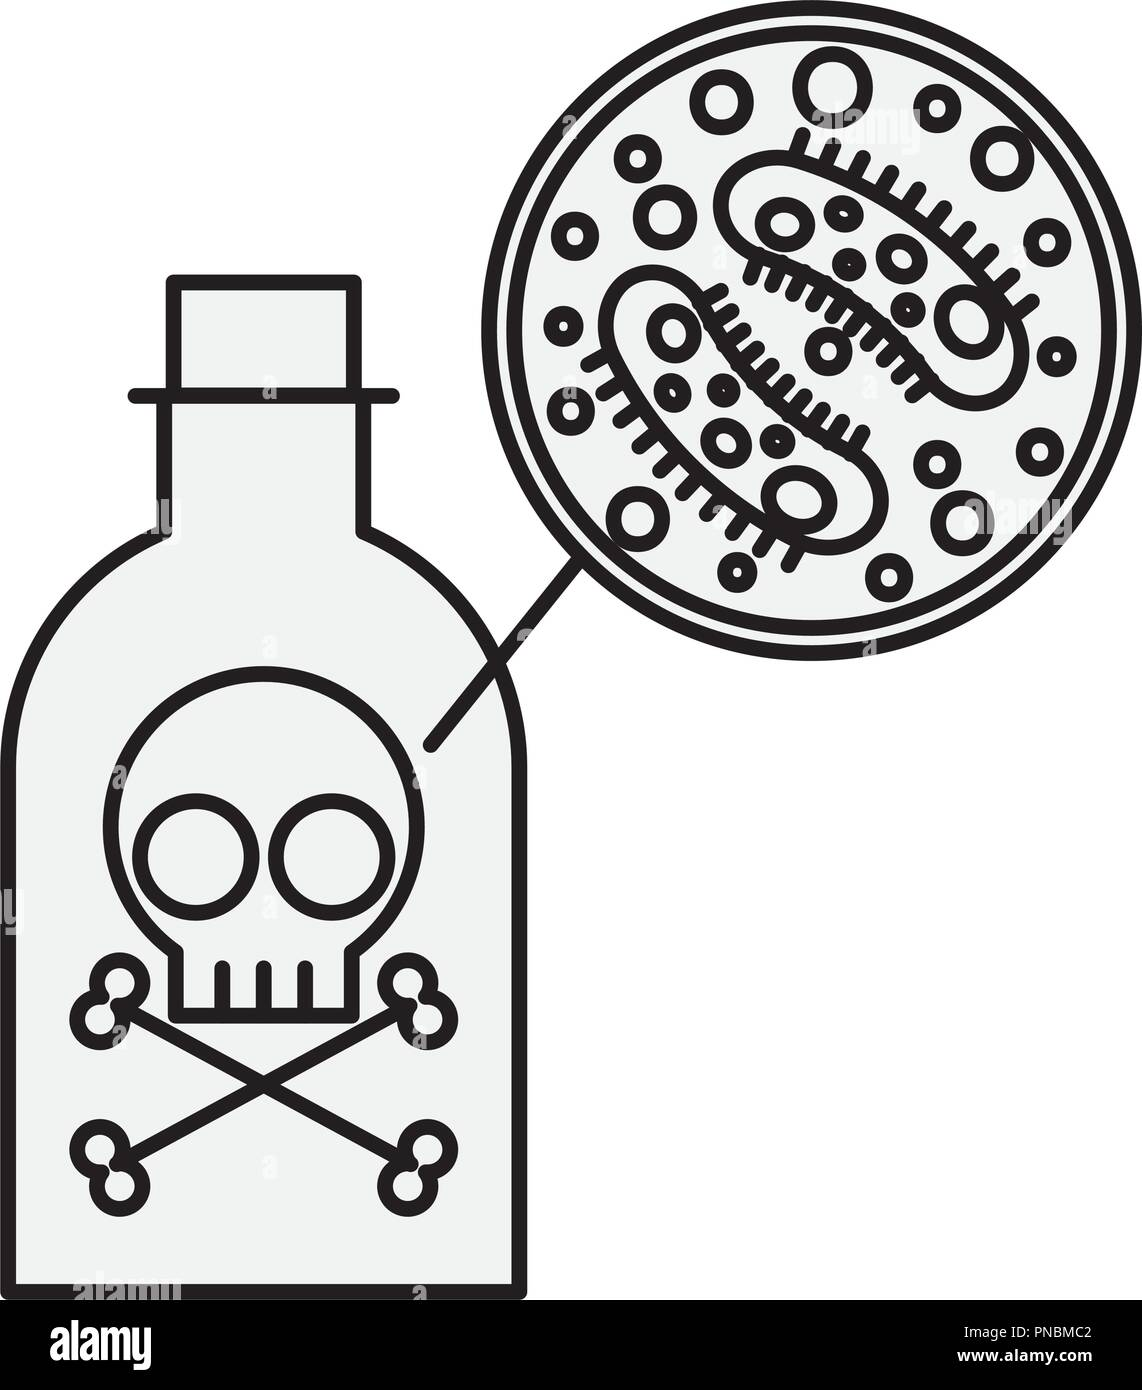 Gift Flasche Gefahr Bakterien Viren Stockbild